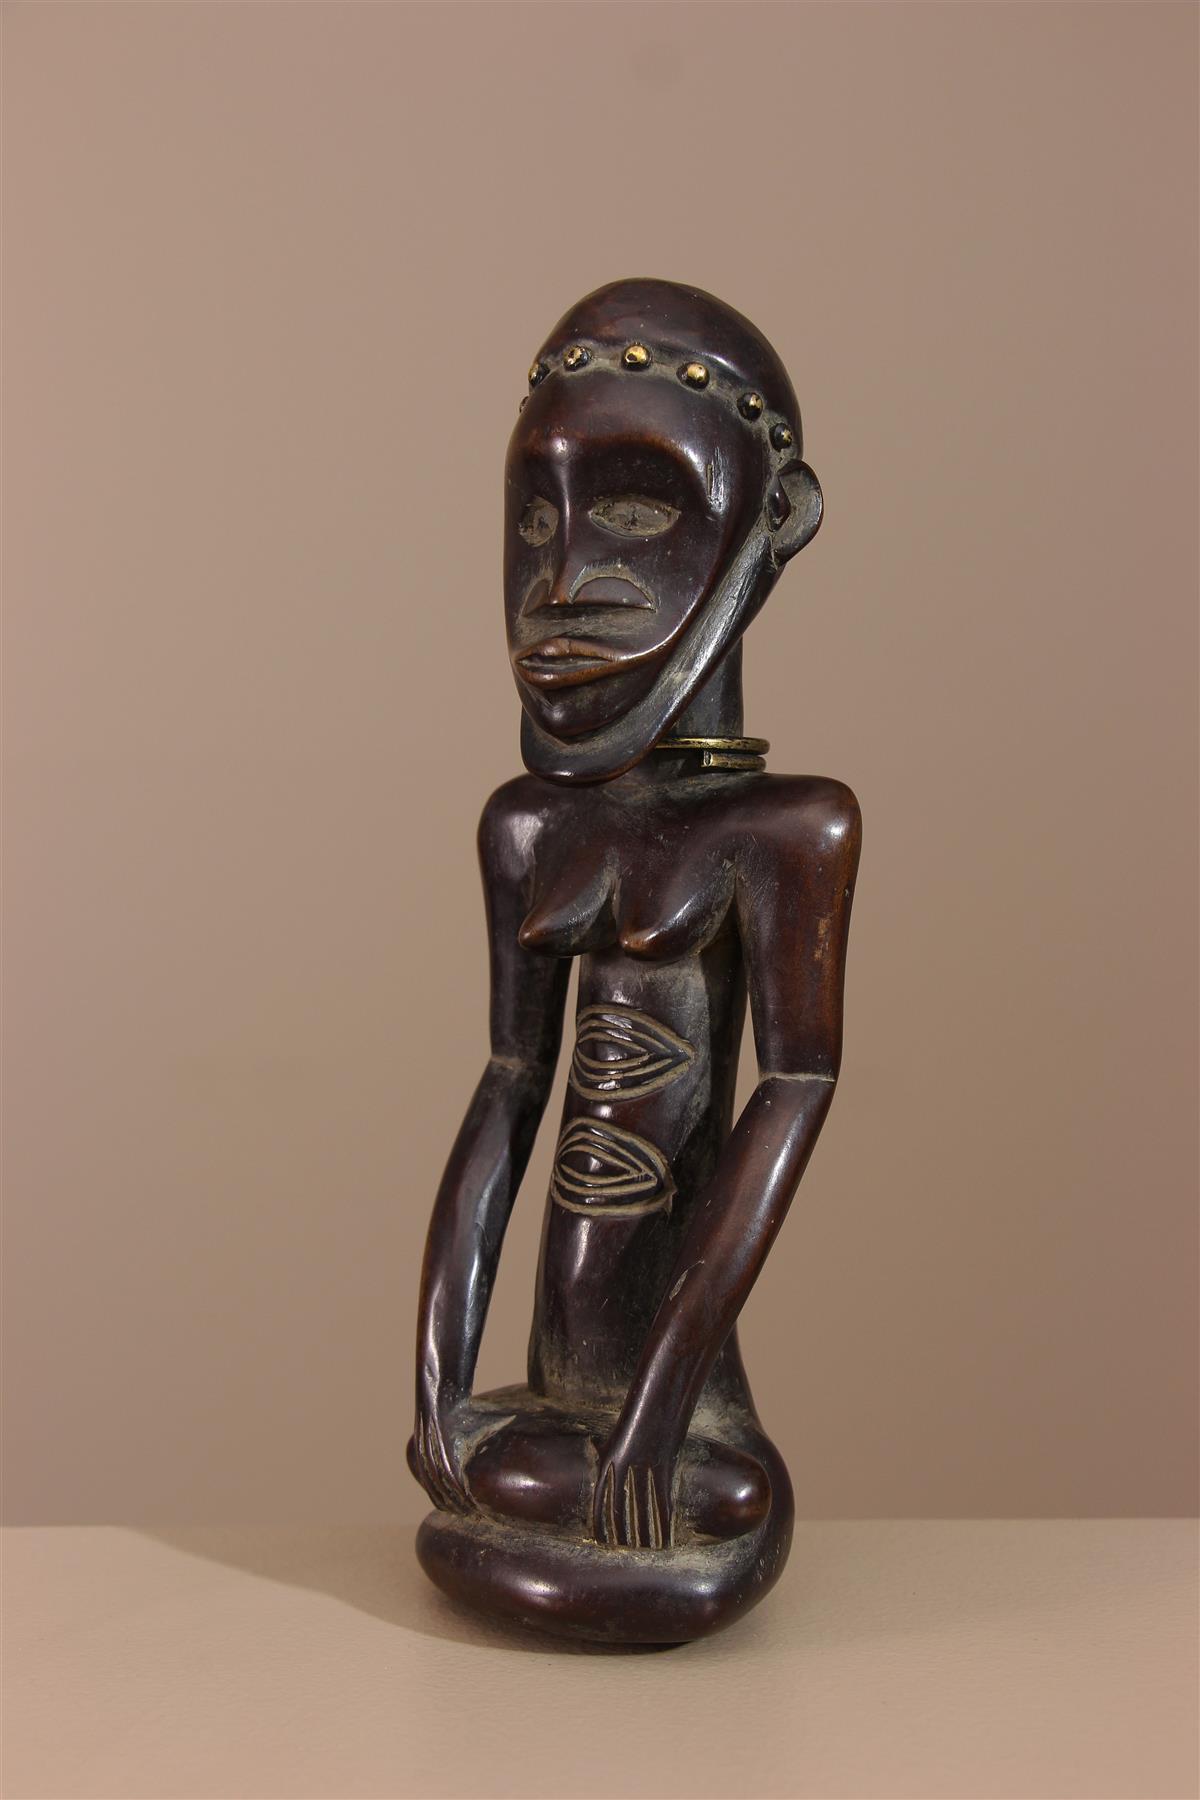 Figurine Bembé - Déco africaine - Art africain traditionnel